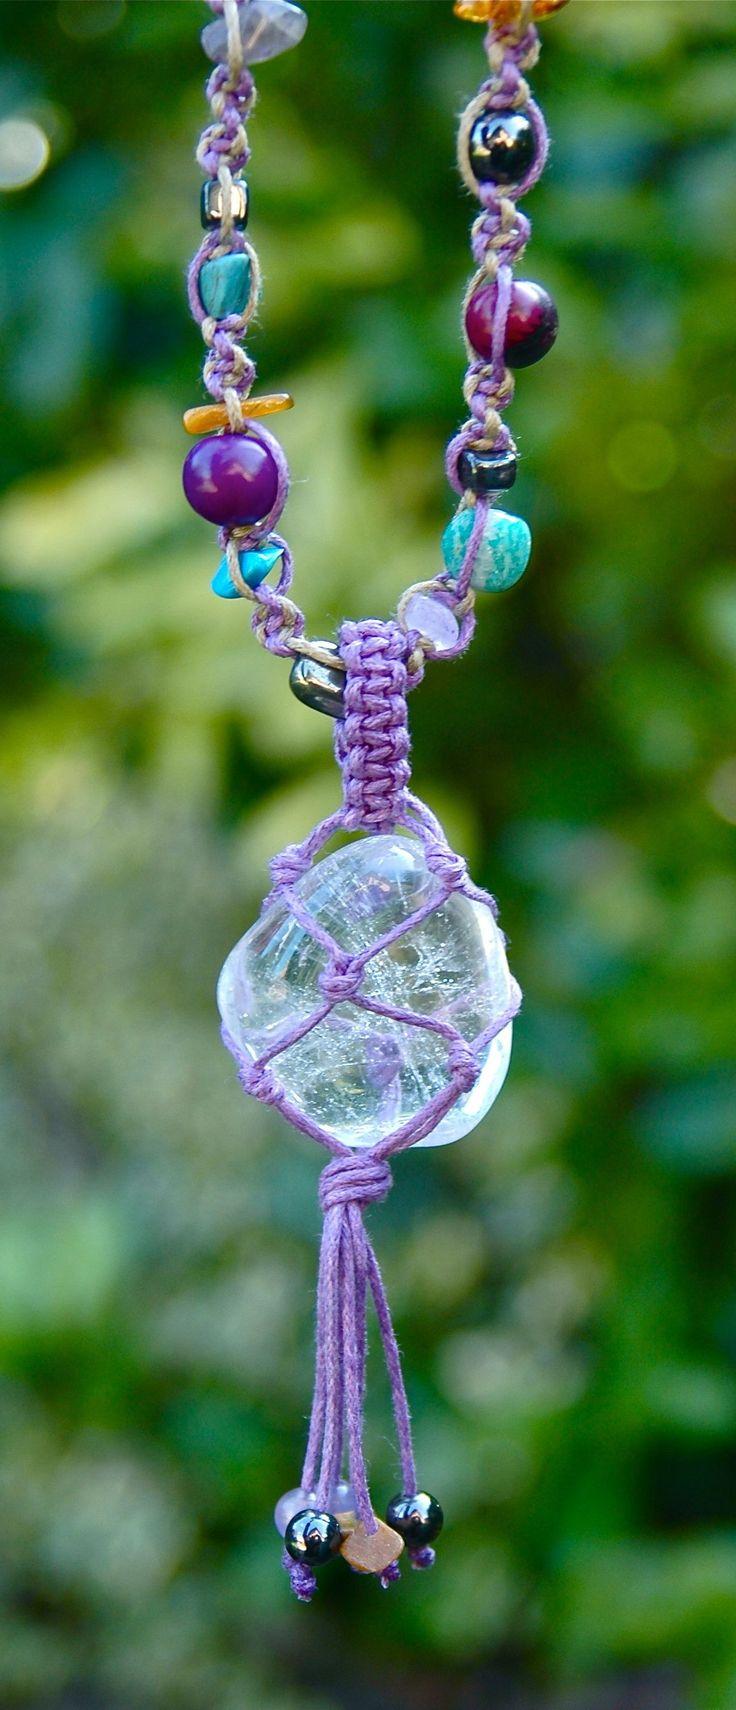 Clear quartz macrame crystal necklace, colourful boho jewellery by TessHeaven on Etsy  https://www.etsy.com/uk/listing/227057908/quartz-crystal-necklace-clear-quartz?ref=shop_home_feat_3